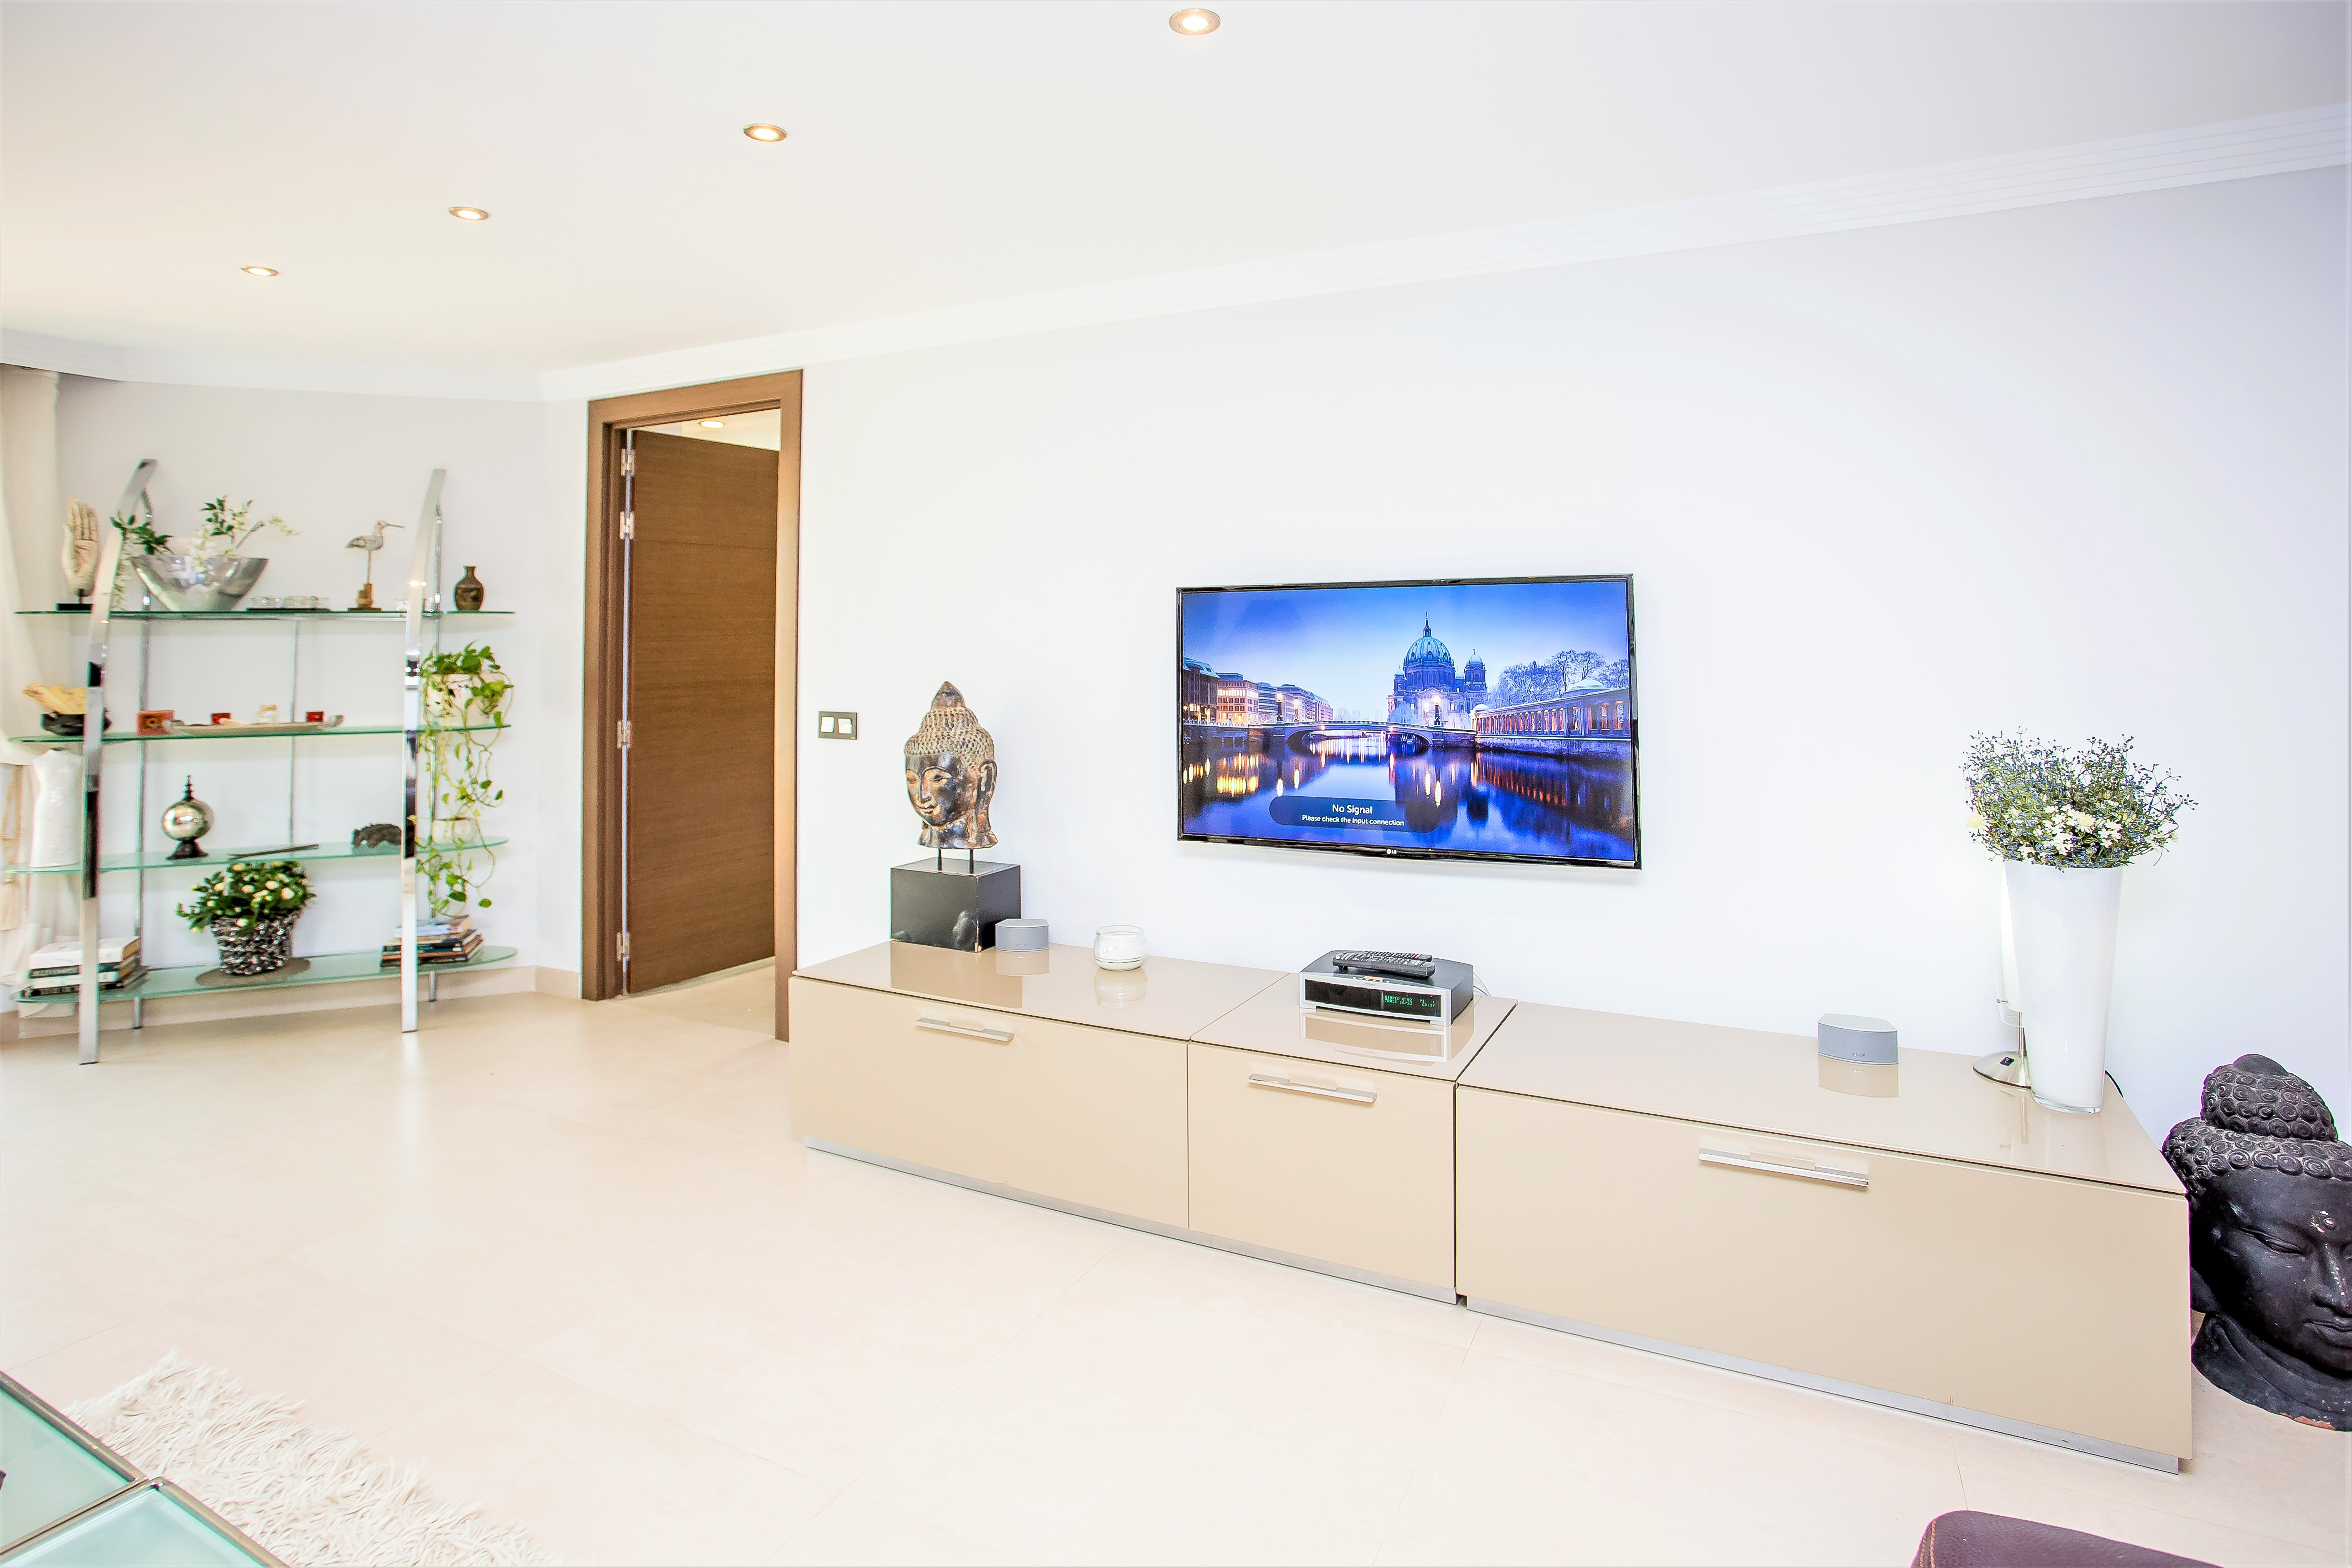 Apartment 8 Bedroom VILLA BY PUERTO BANUS   SEA 5 min                                photo 20286068